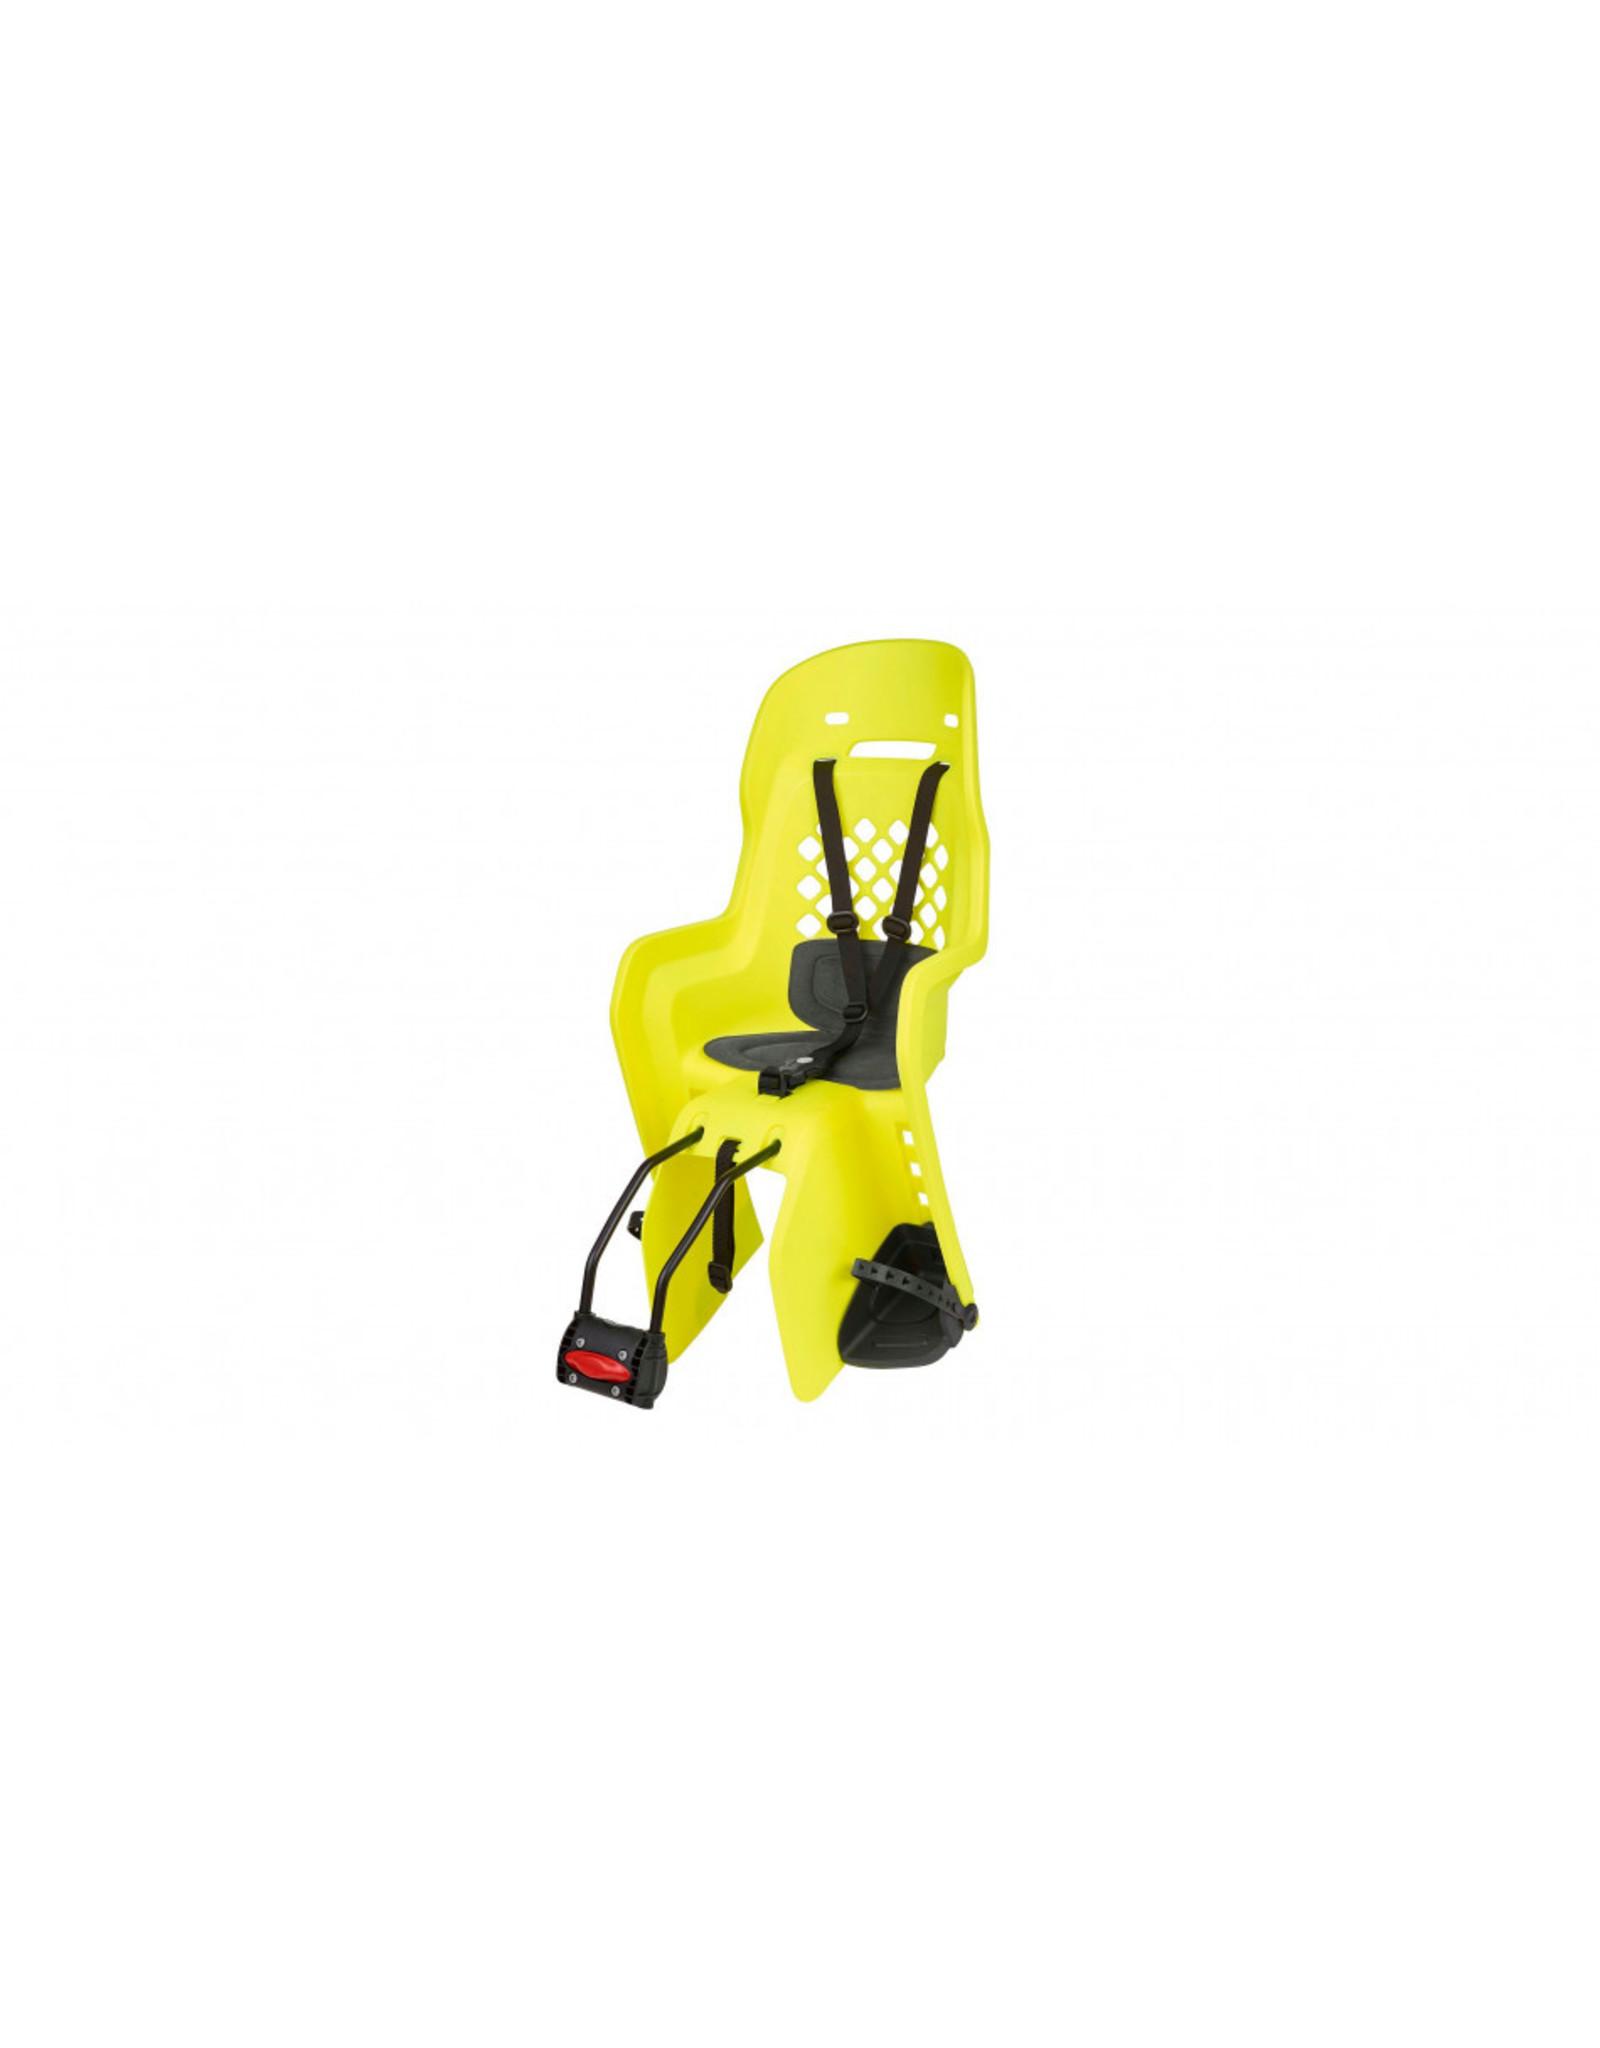 Polisport kinderzitje Joy fluo geel op frame